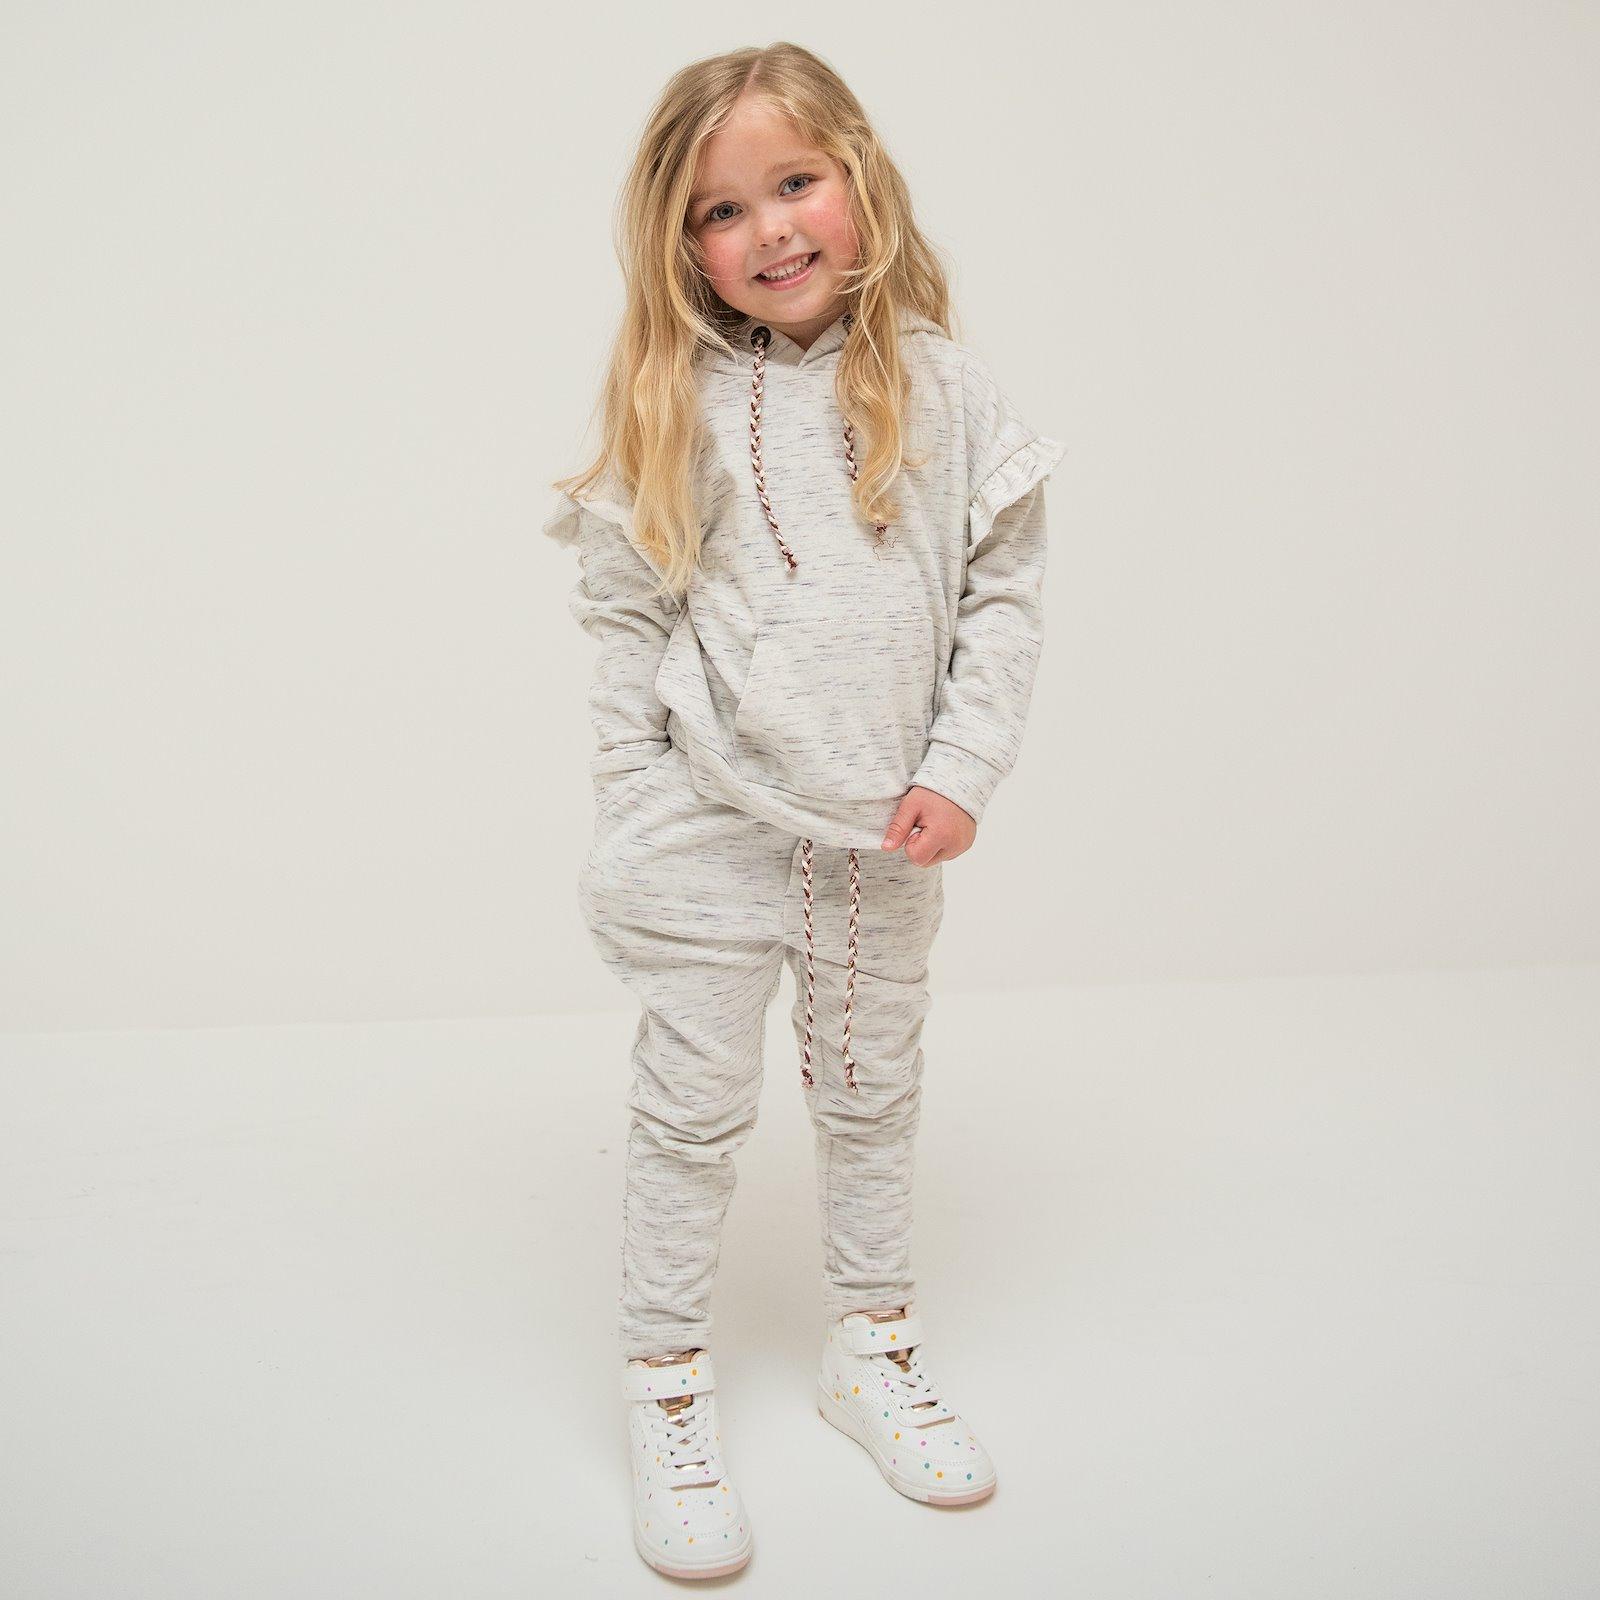 Sweatshirt w. hood + pocket, 134/9y p62020_211789_43694_22415_p60034_sskit